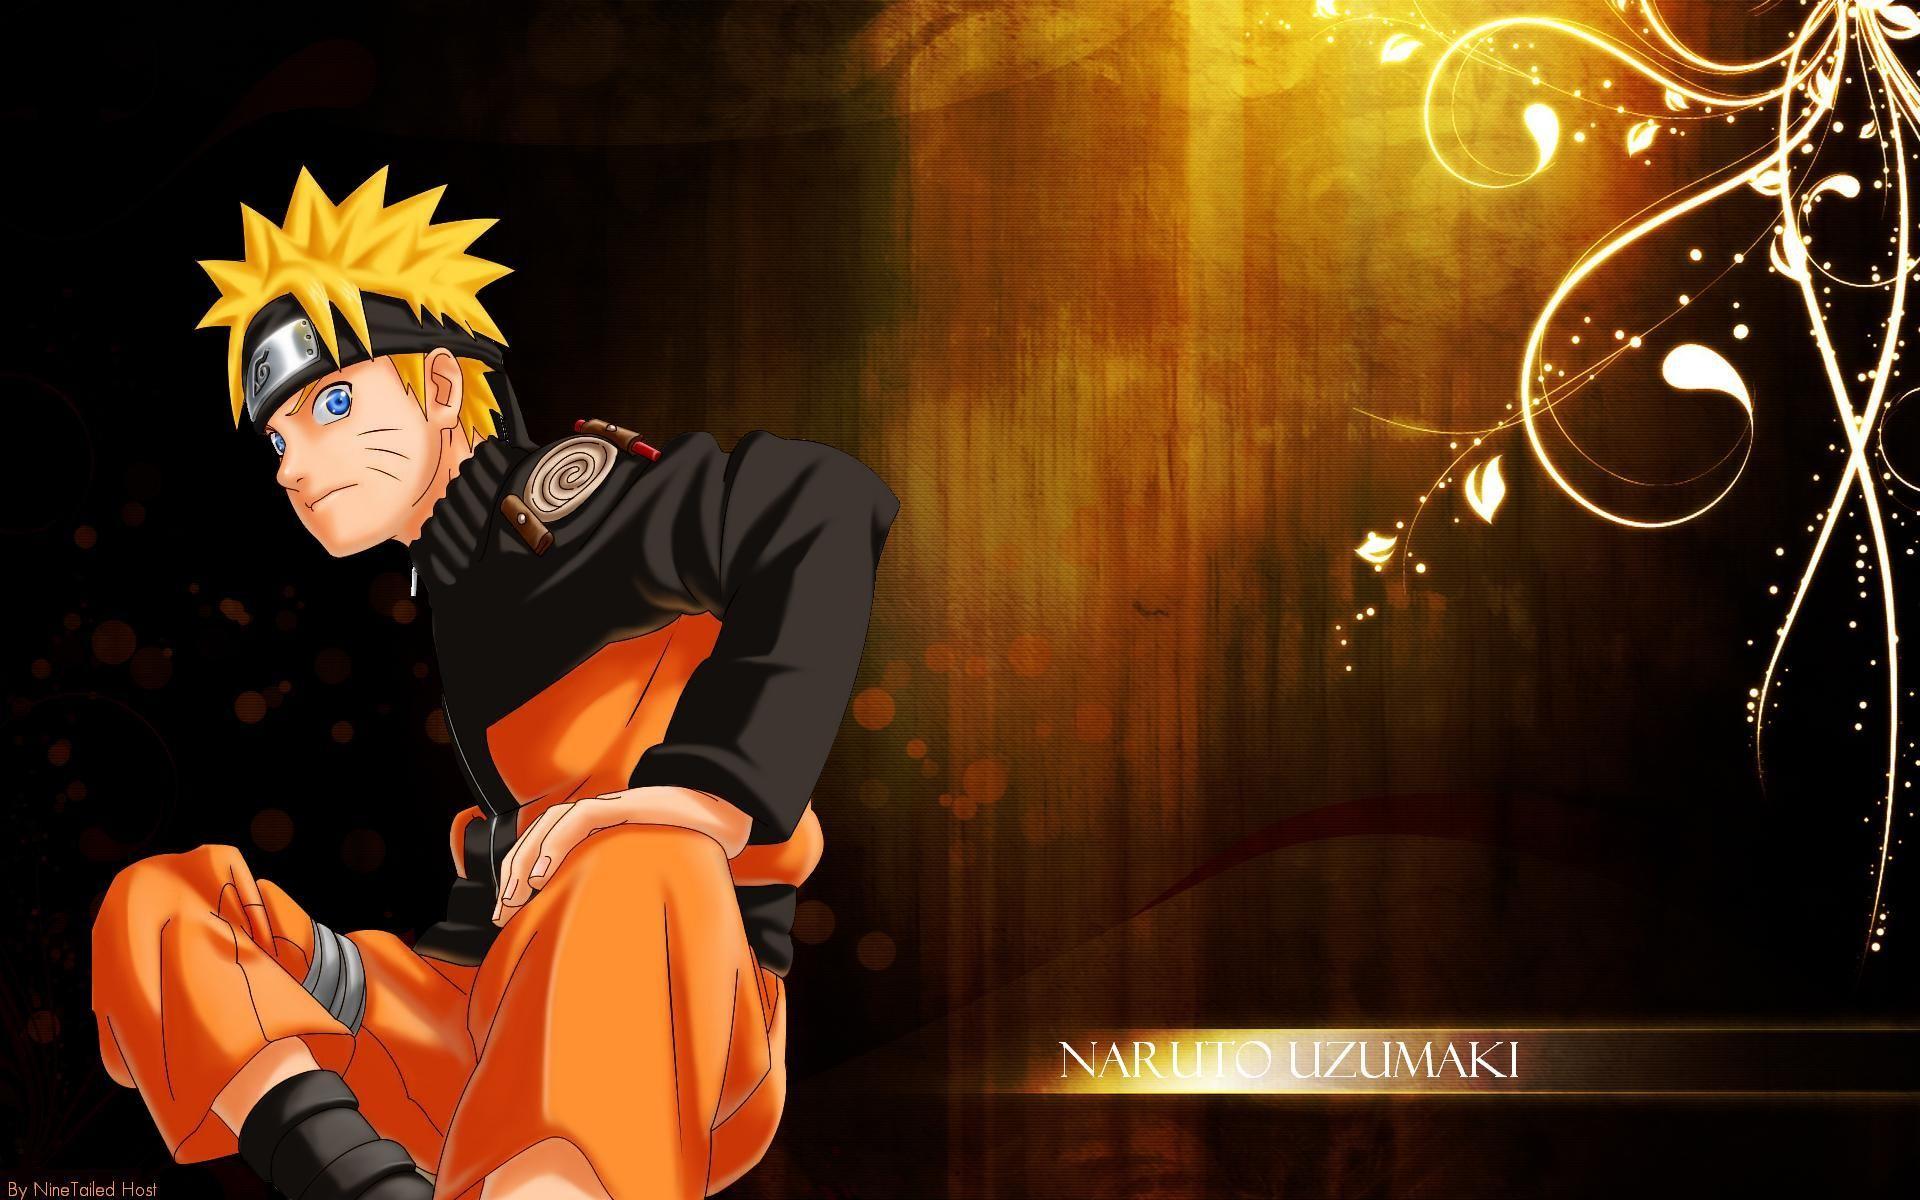 Naruto Uzumaki Wallpapers Phone